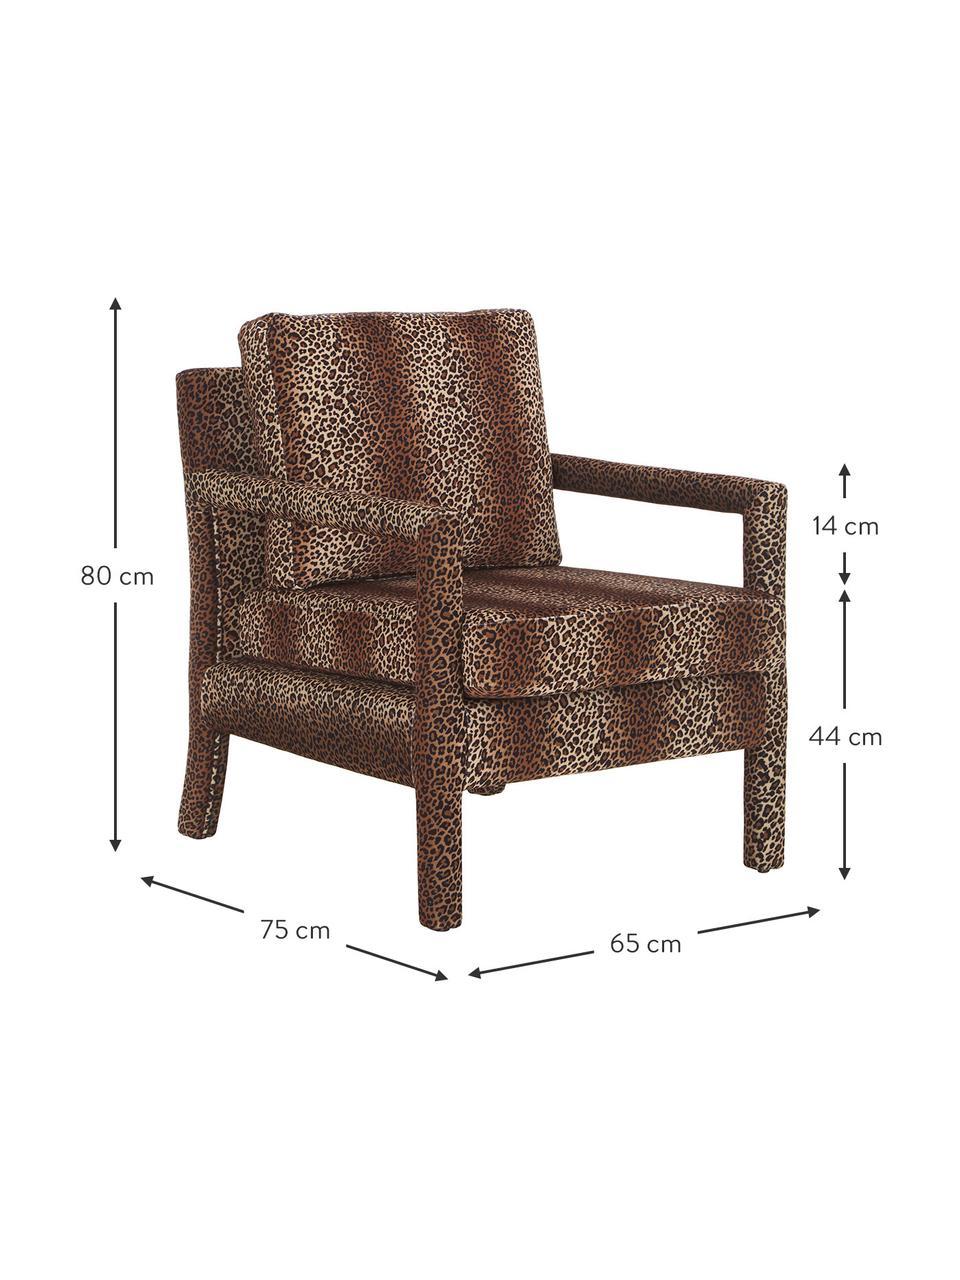 Samt-Sessel Claudette mit braunem Leo-Muster, Bezug: Samt (100% Polyester) Der, Gestell: Massives Kiefernholz, Spe, Samt Braun, B 65 x T 75 cm